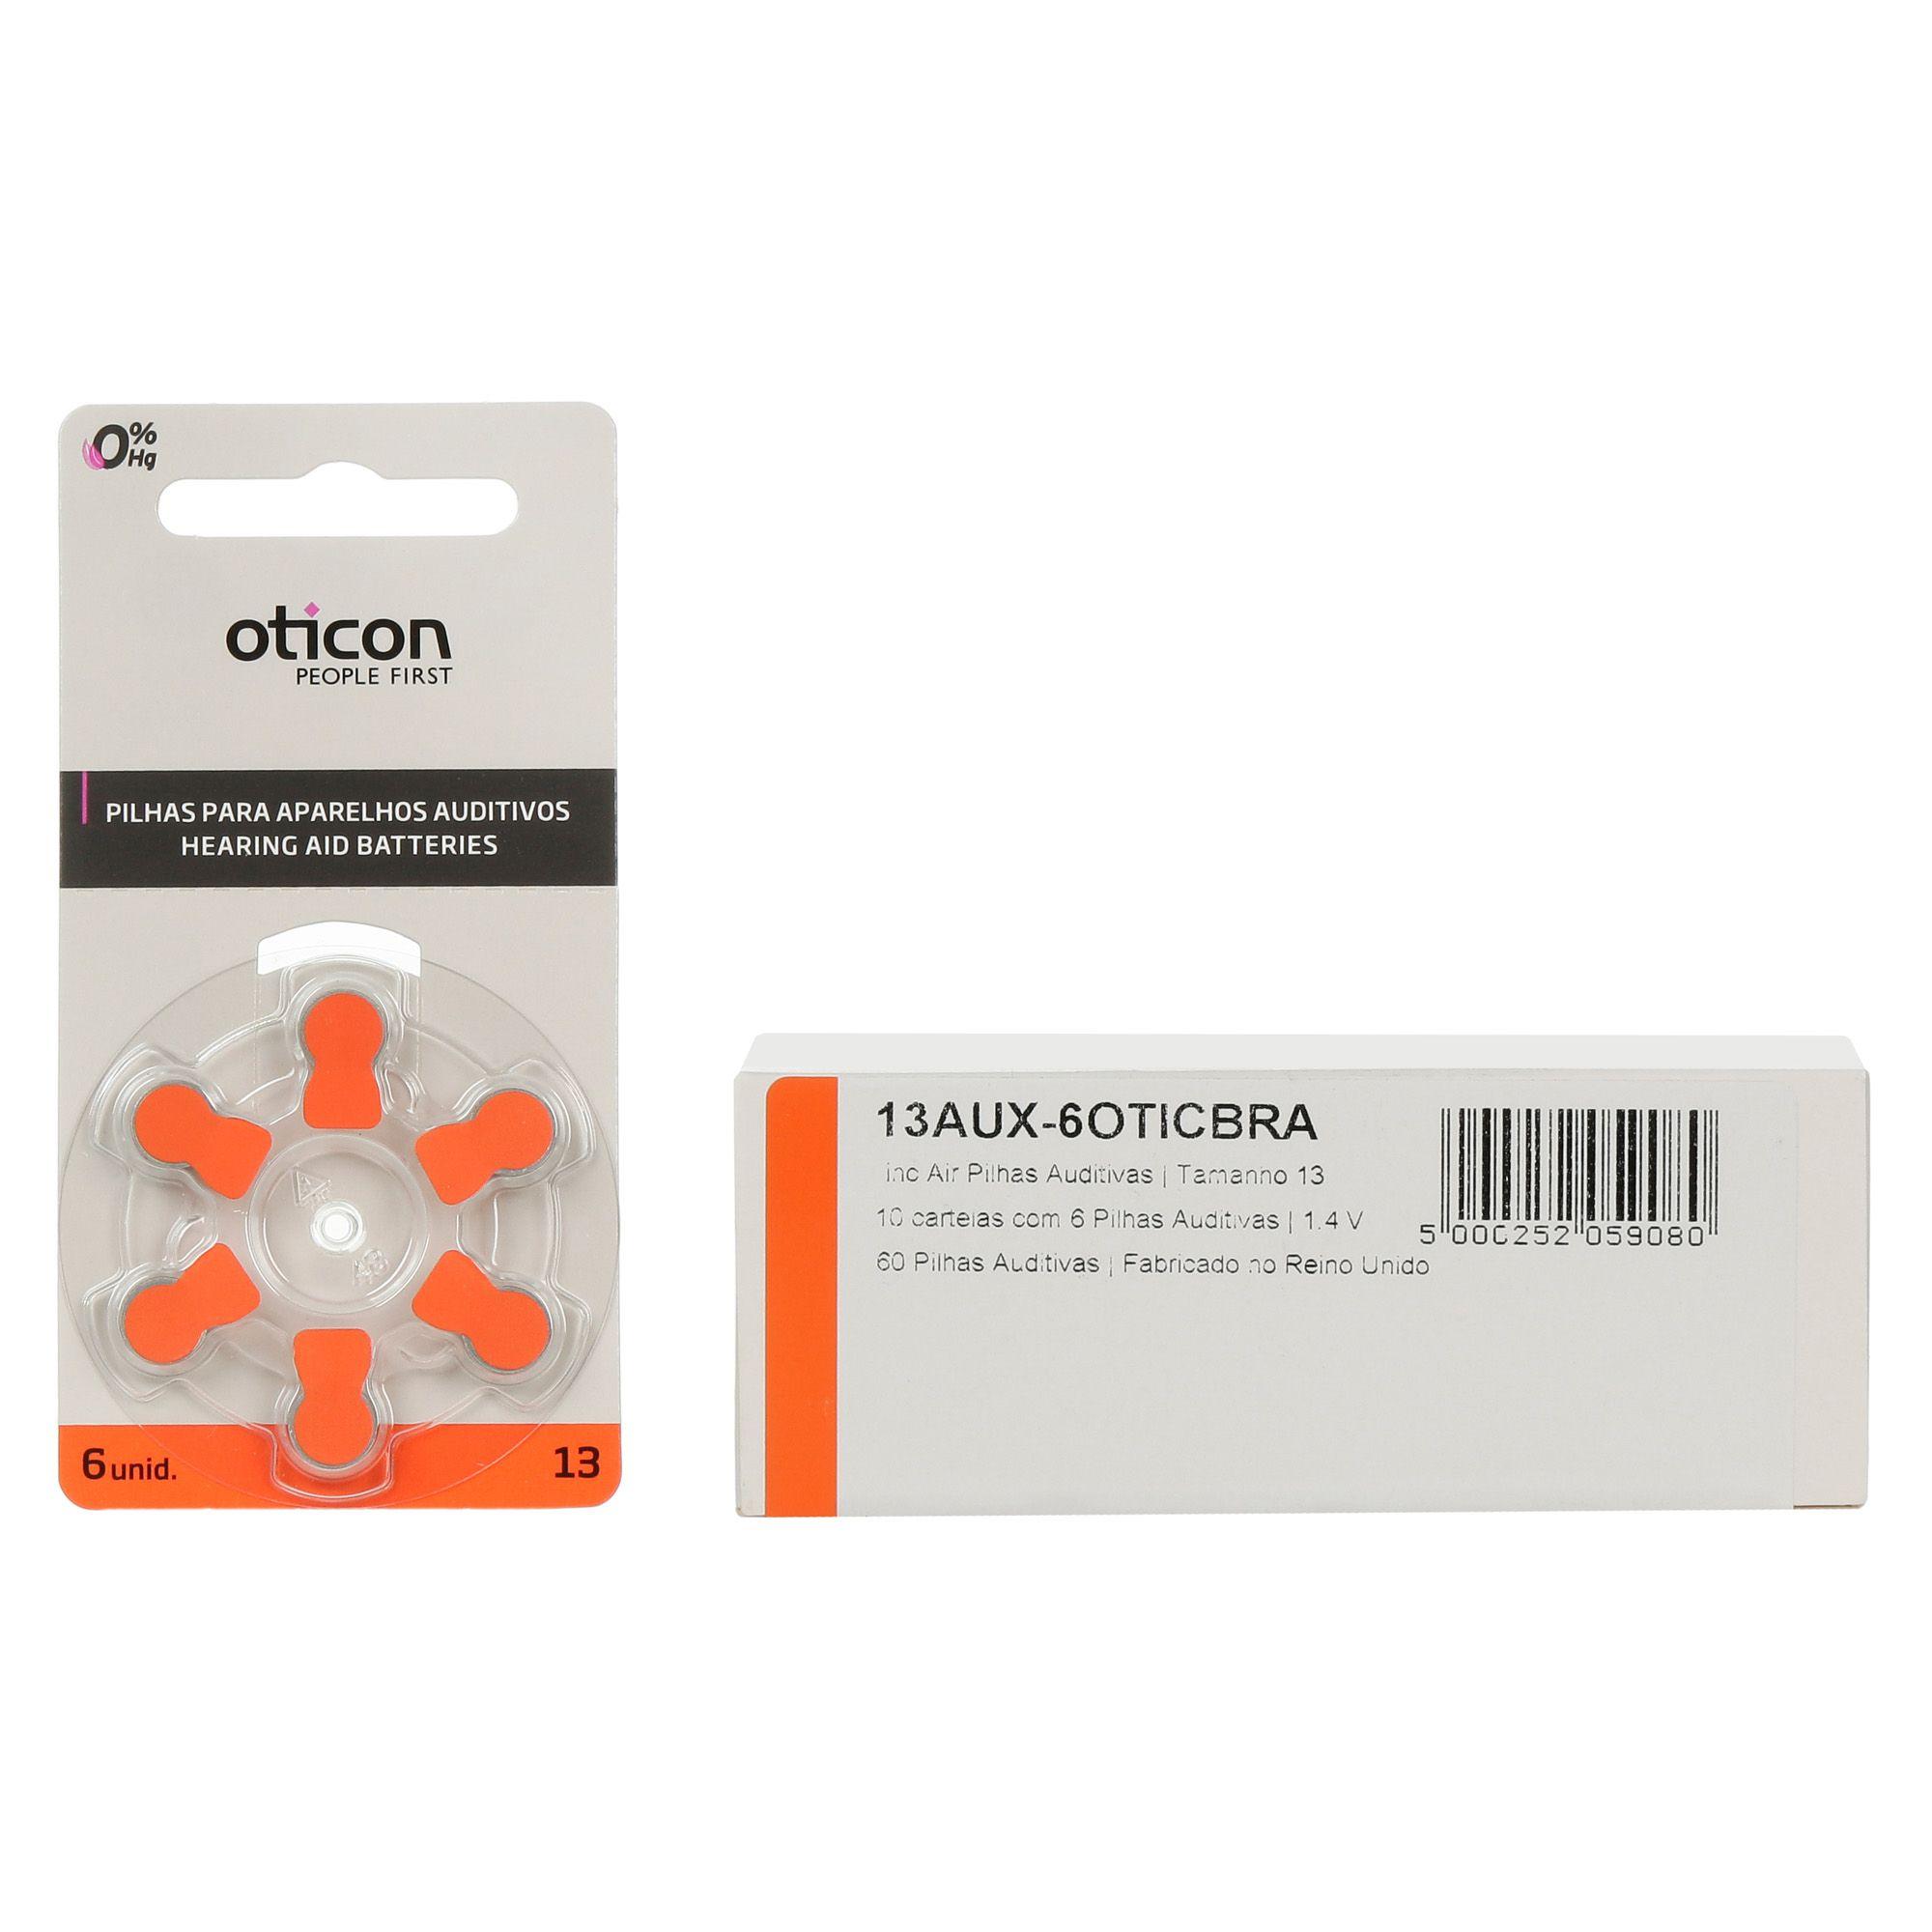 OTICON 13 / PR48 - 10 Cartelas - 60 Baterias para Aparelho Auditivo